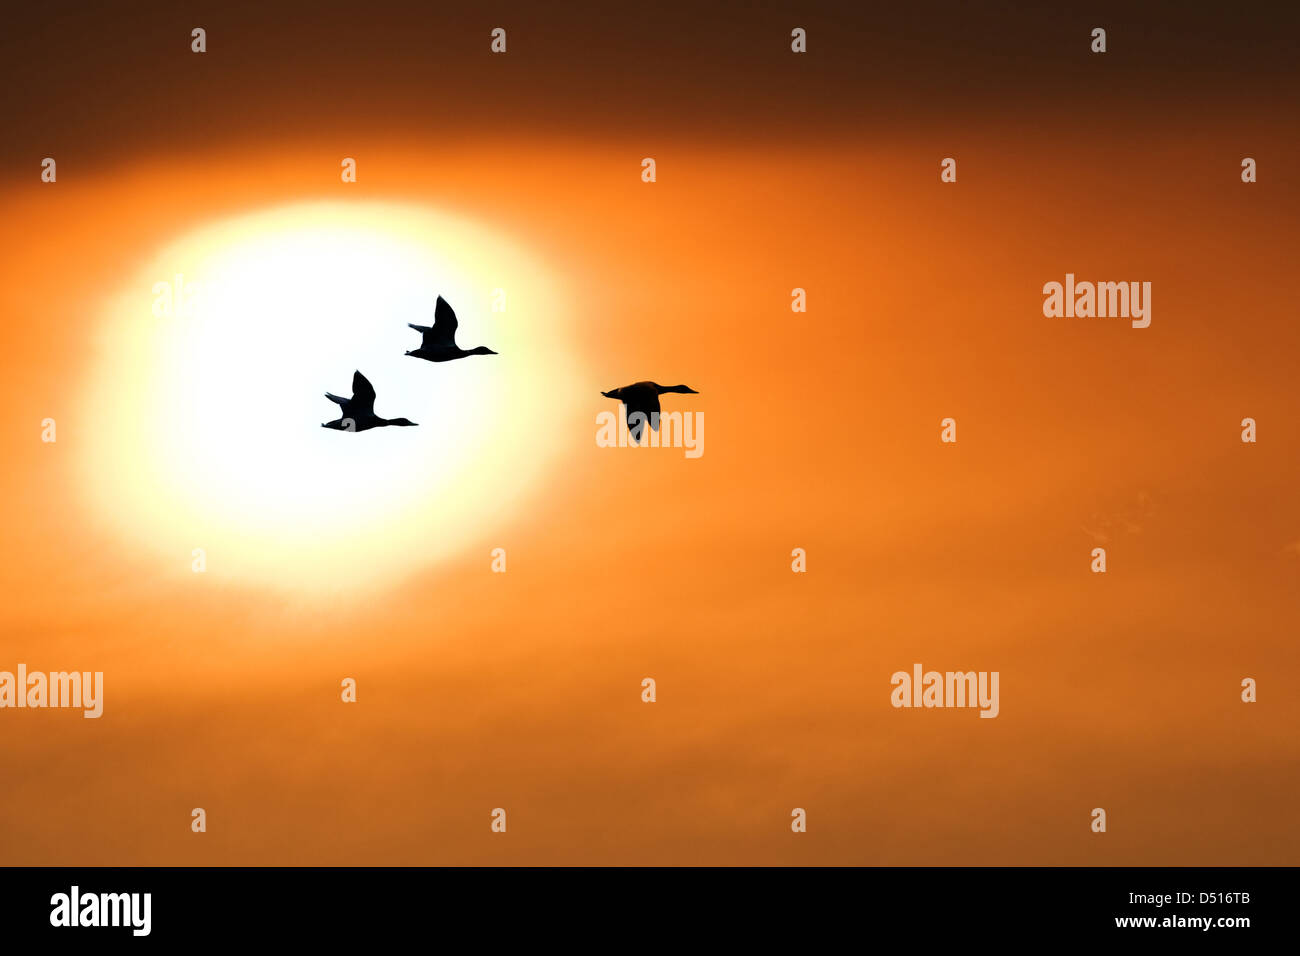 three duck on sunset background - Stock Image